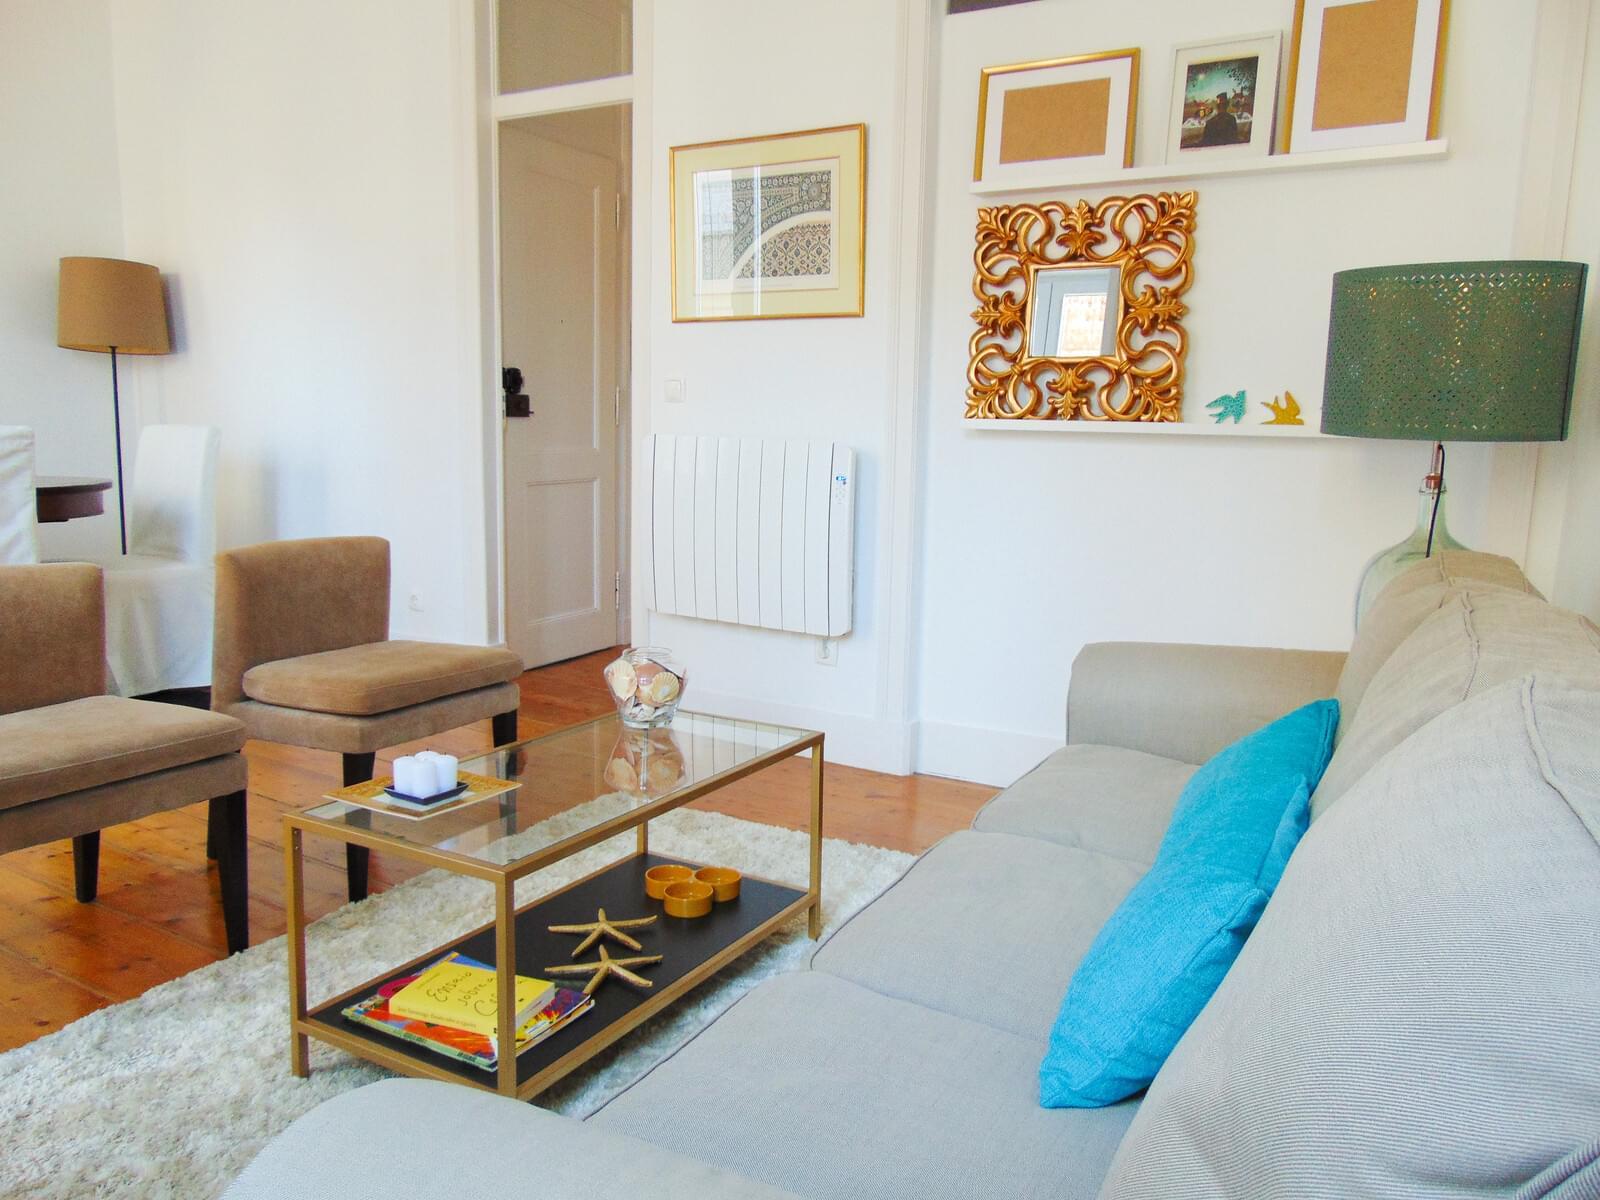 pf18269-apartamento-t1-lisboa-77dc87b3-0846-47e5-976c-dfe400a9c380